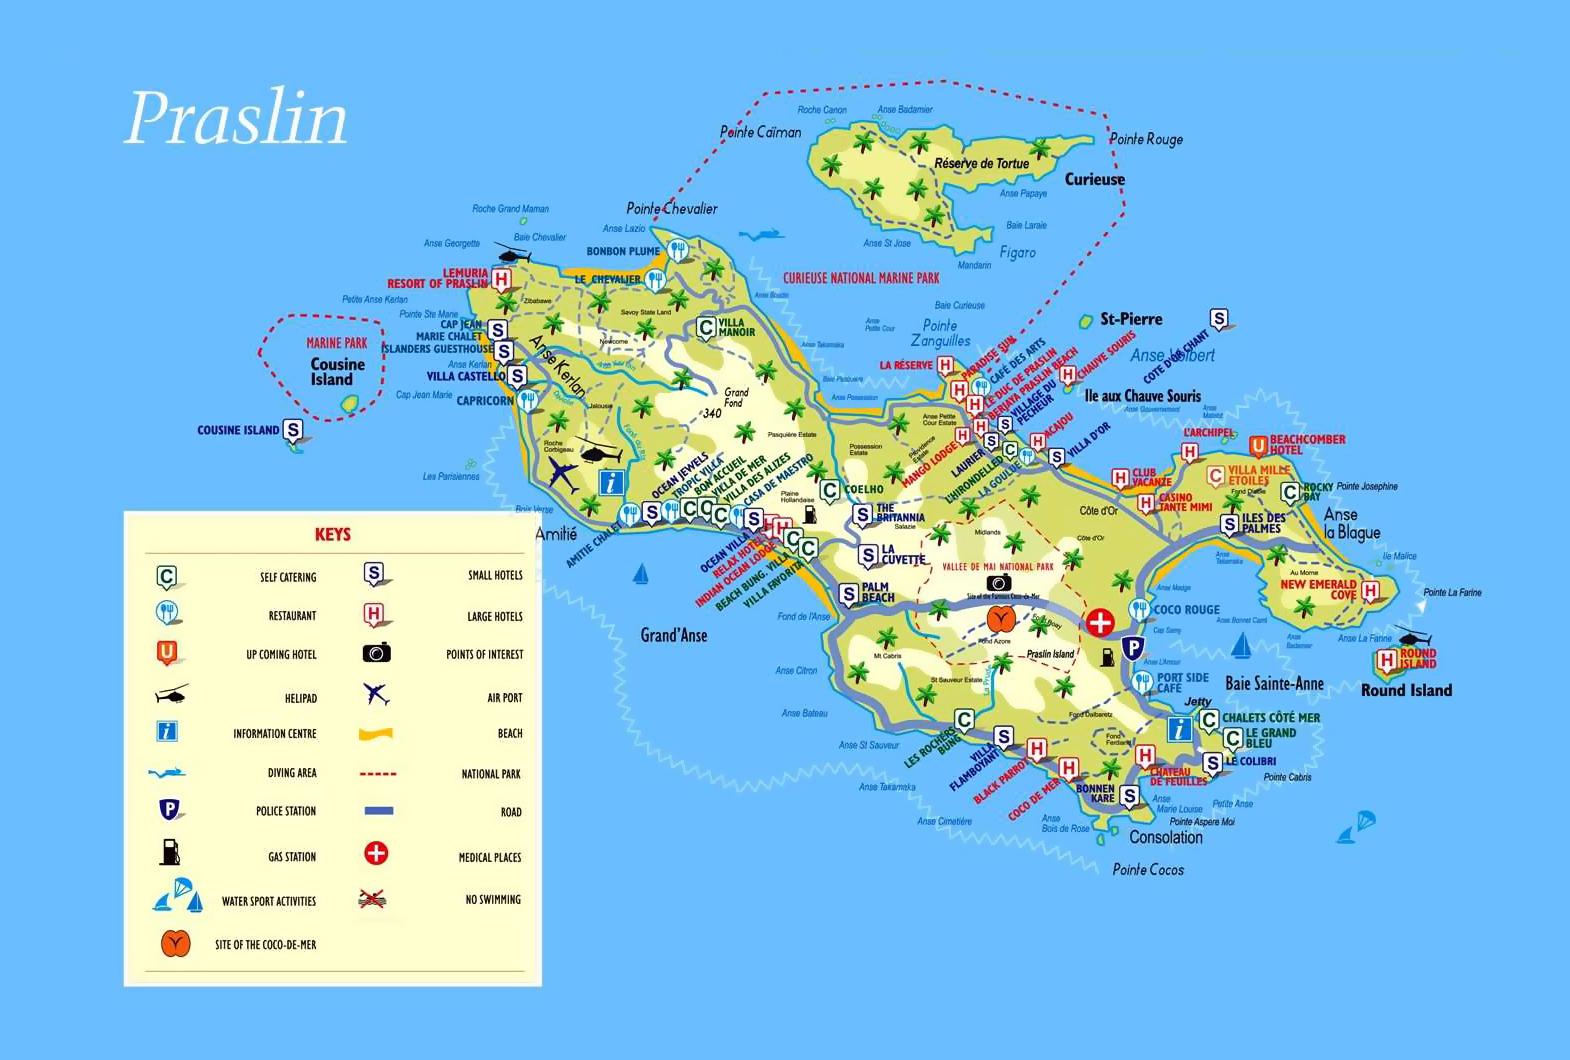 Praslin Island Seychelles World Map Large tourist map of Praslin Island (Seychelles) with all marks